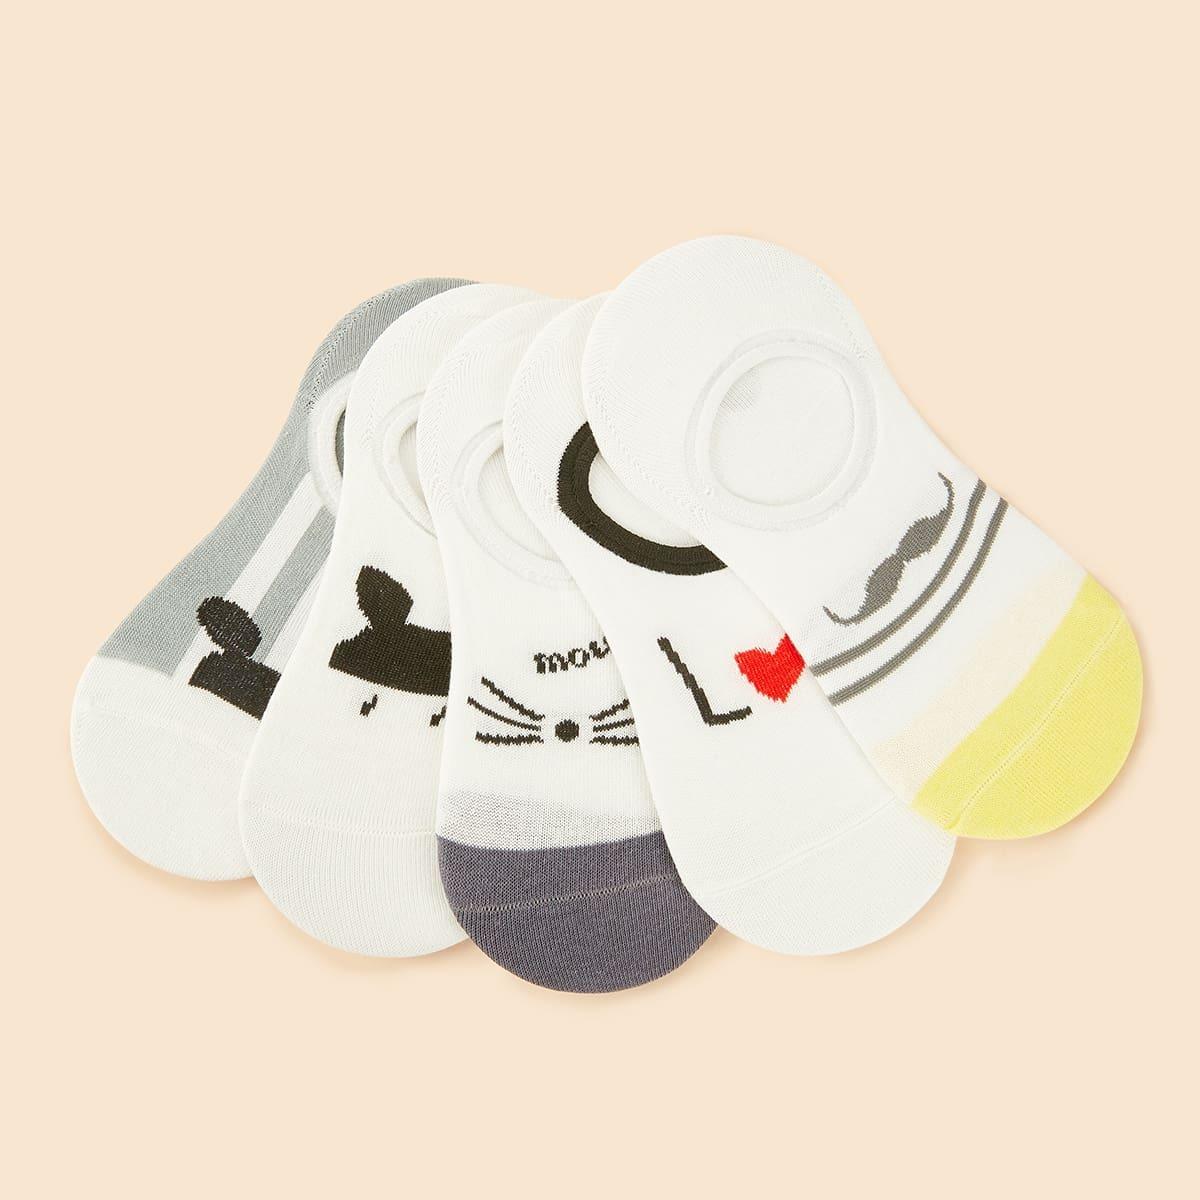 SHEIN / Karikatur Muster unsichtbare Socken 5 Paare